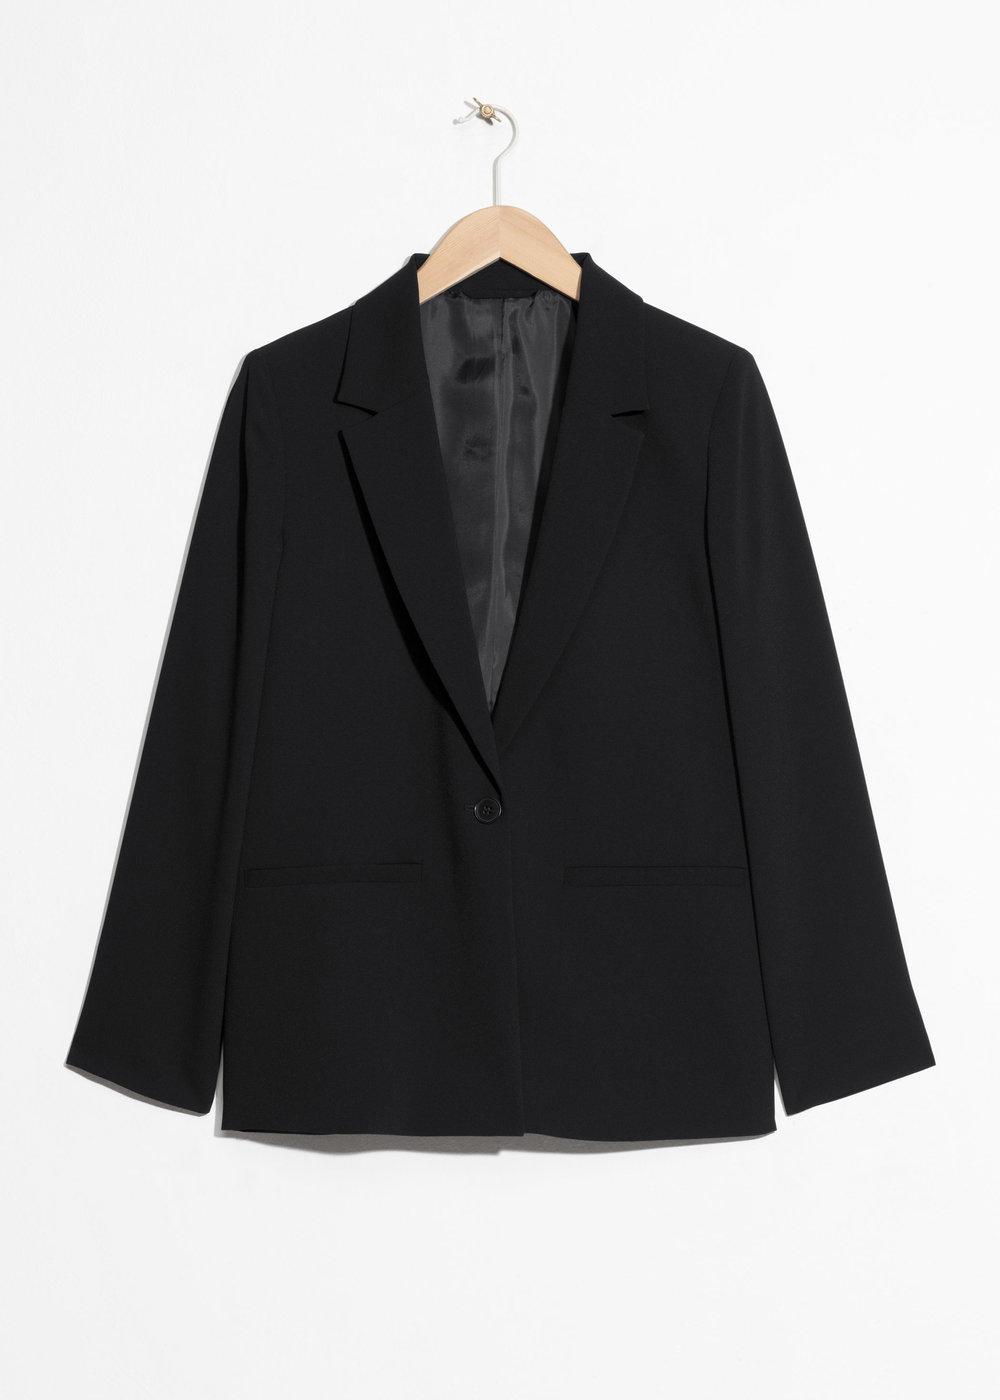 Black Blazer $115